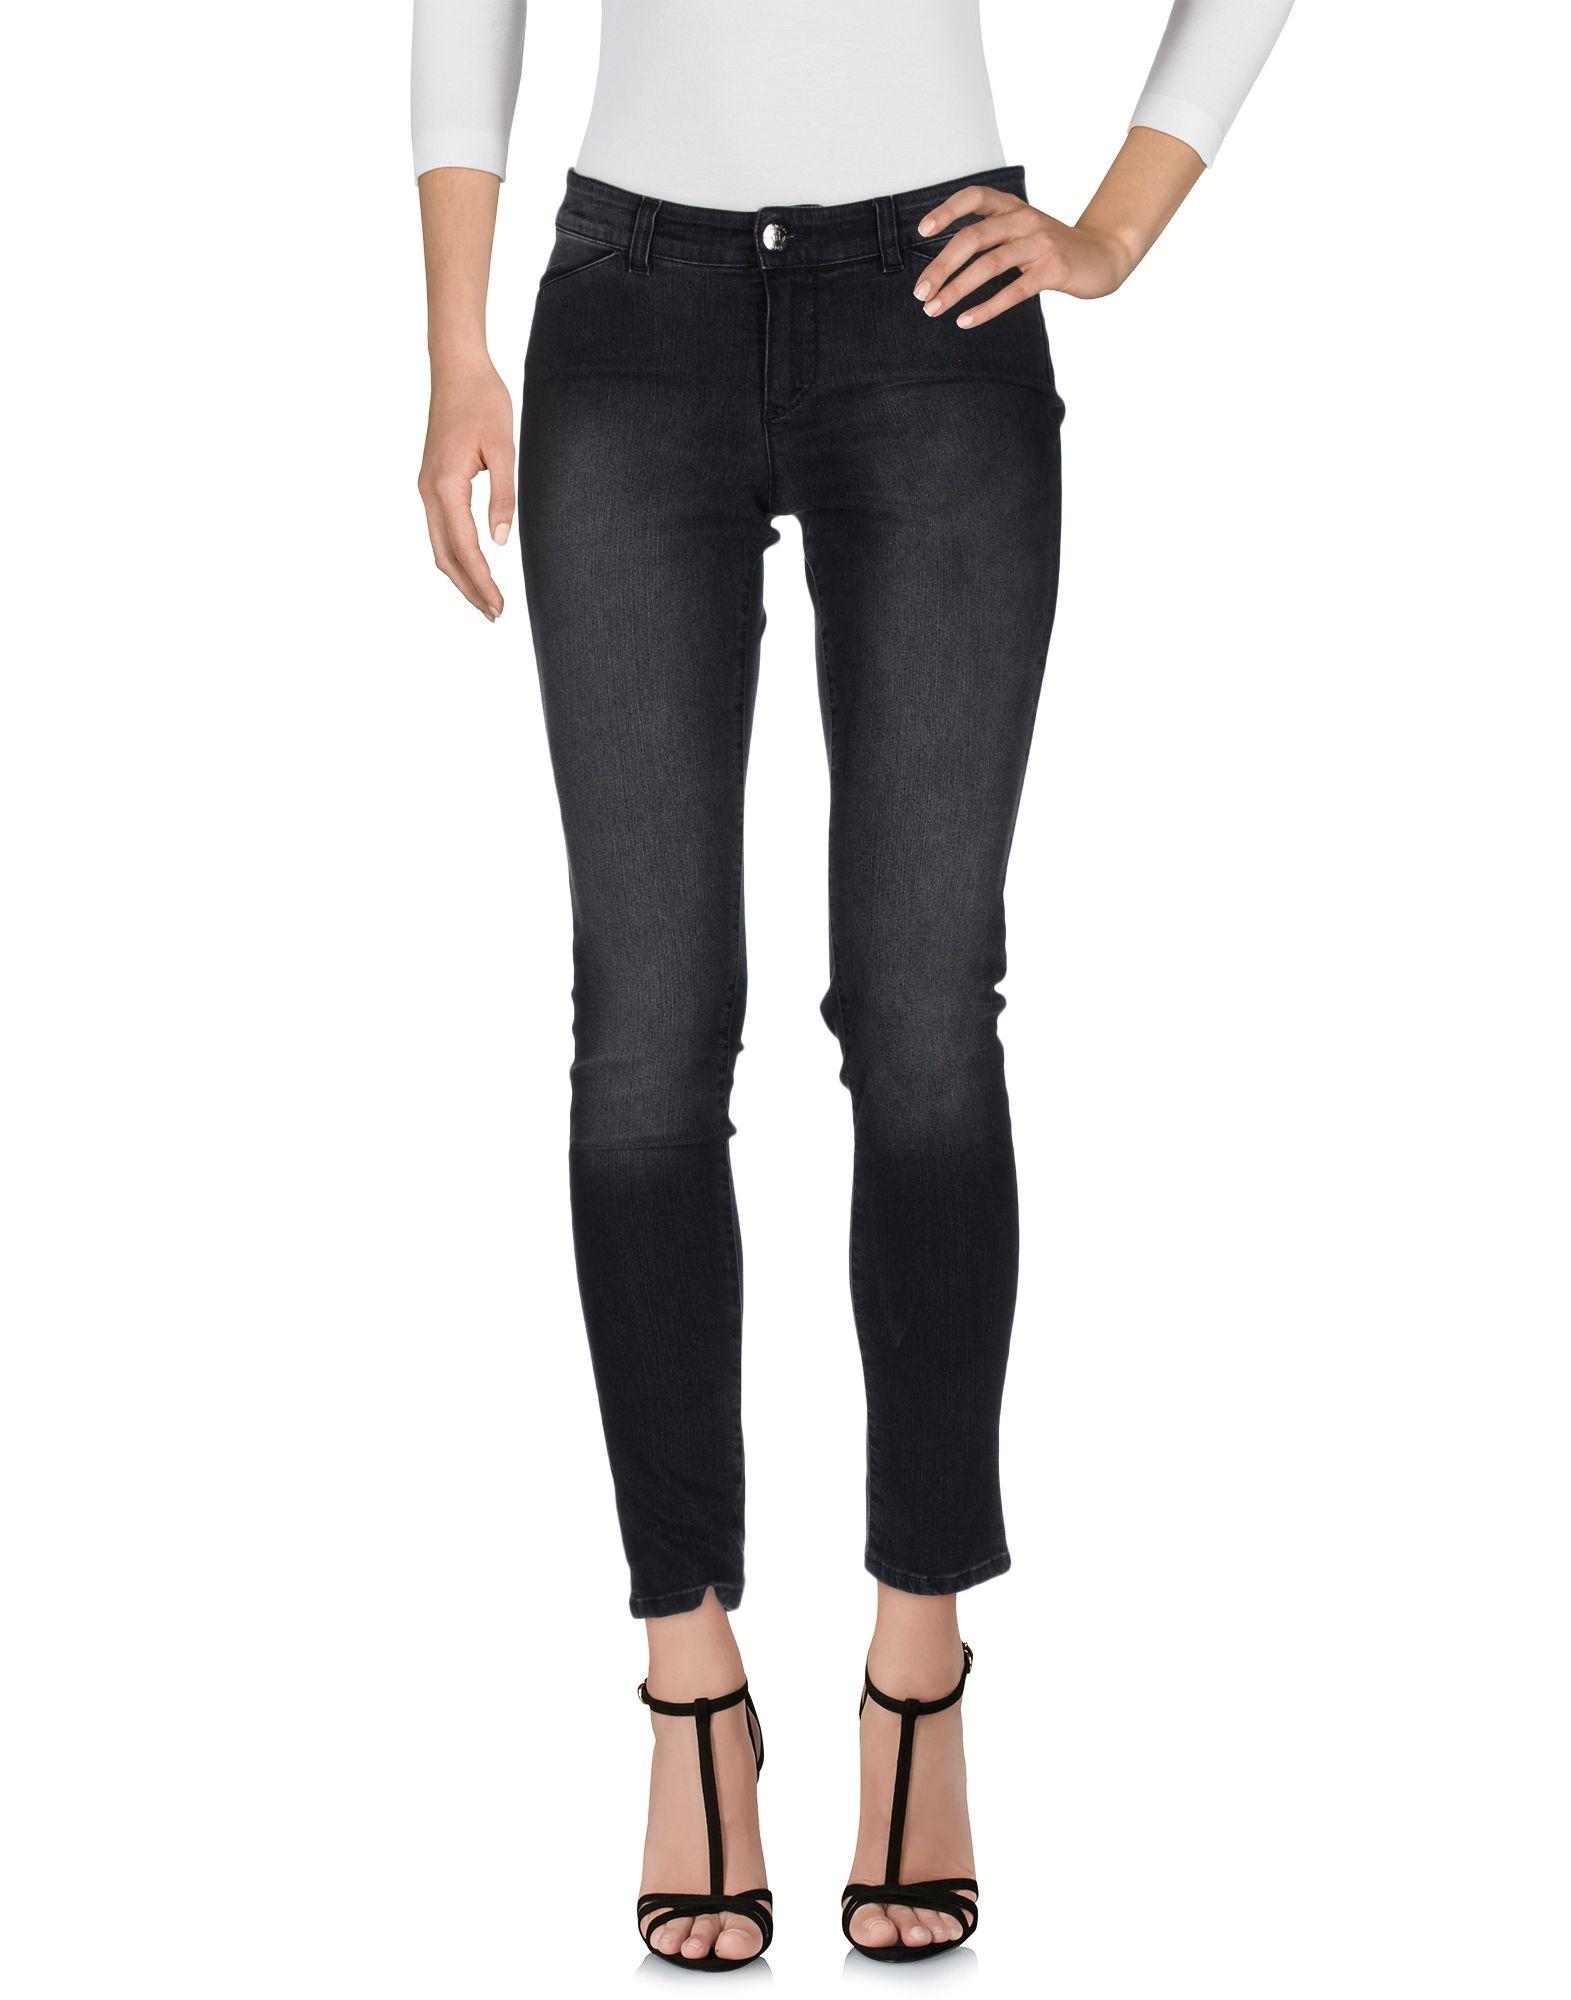 Pantaloni Jeans Dismero Donna - Acquista online su HOYuH3gMQw